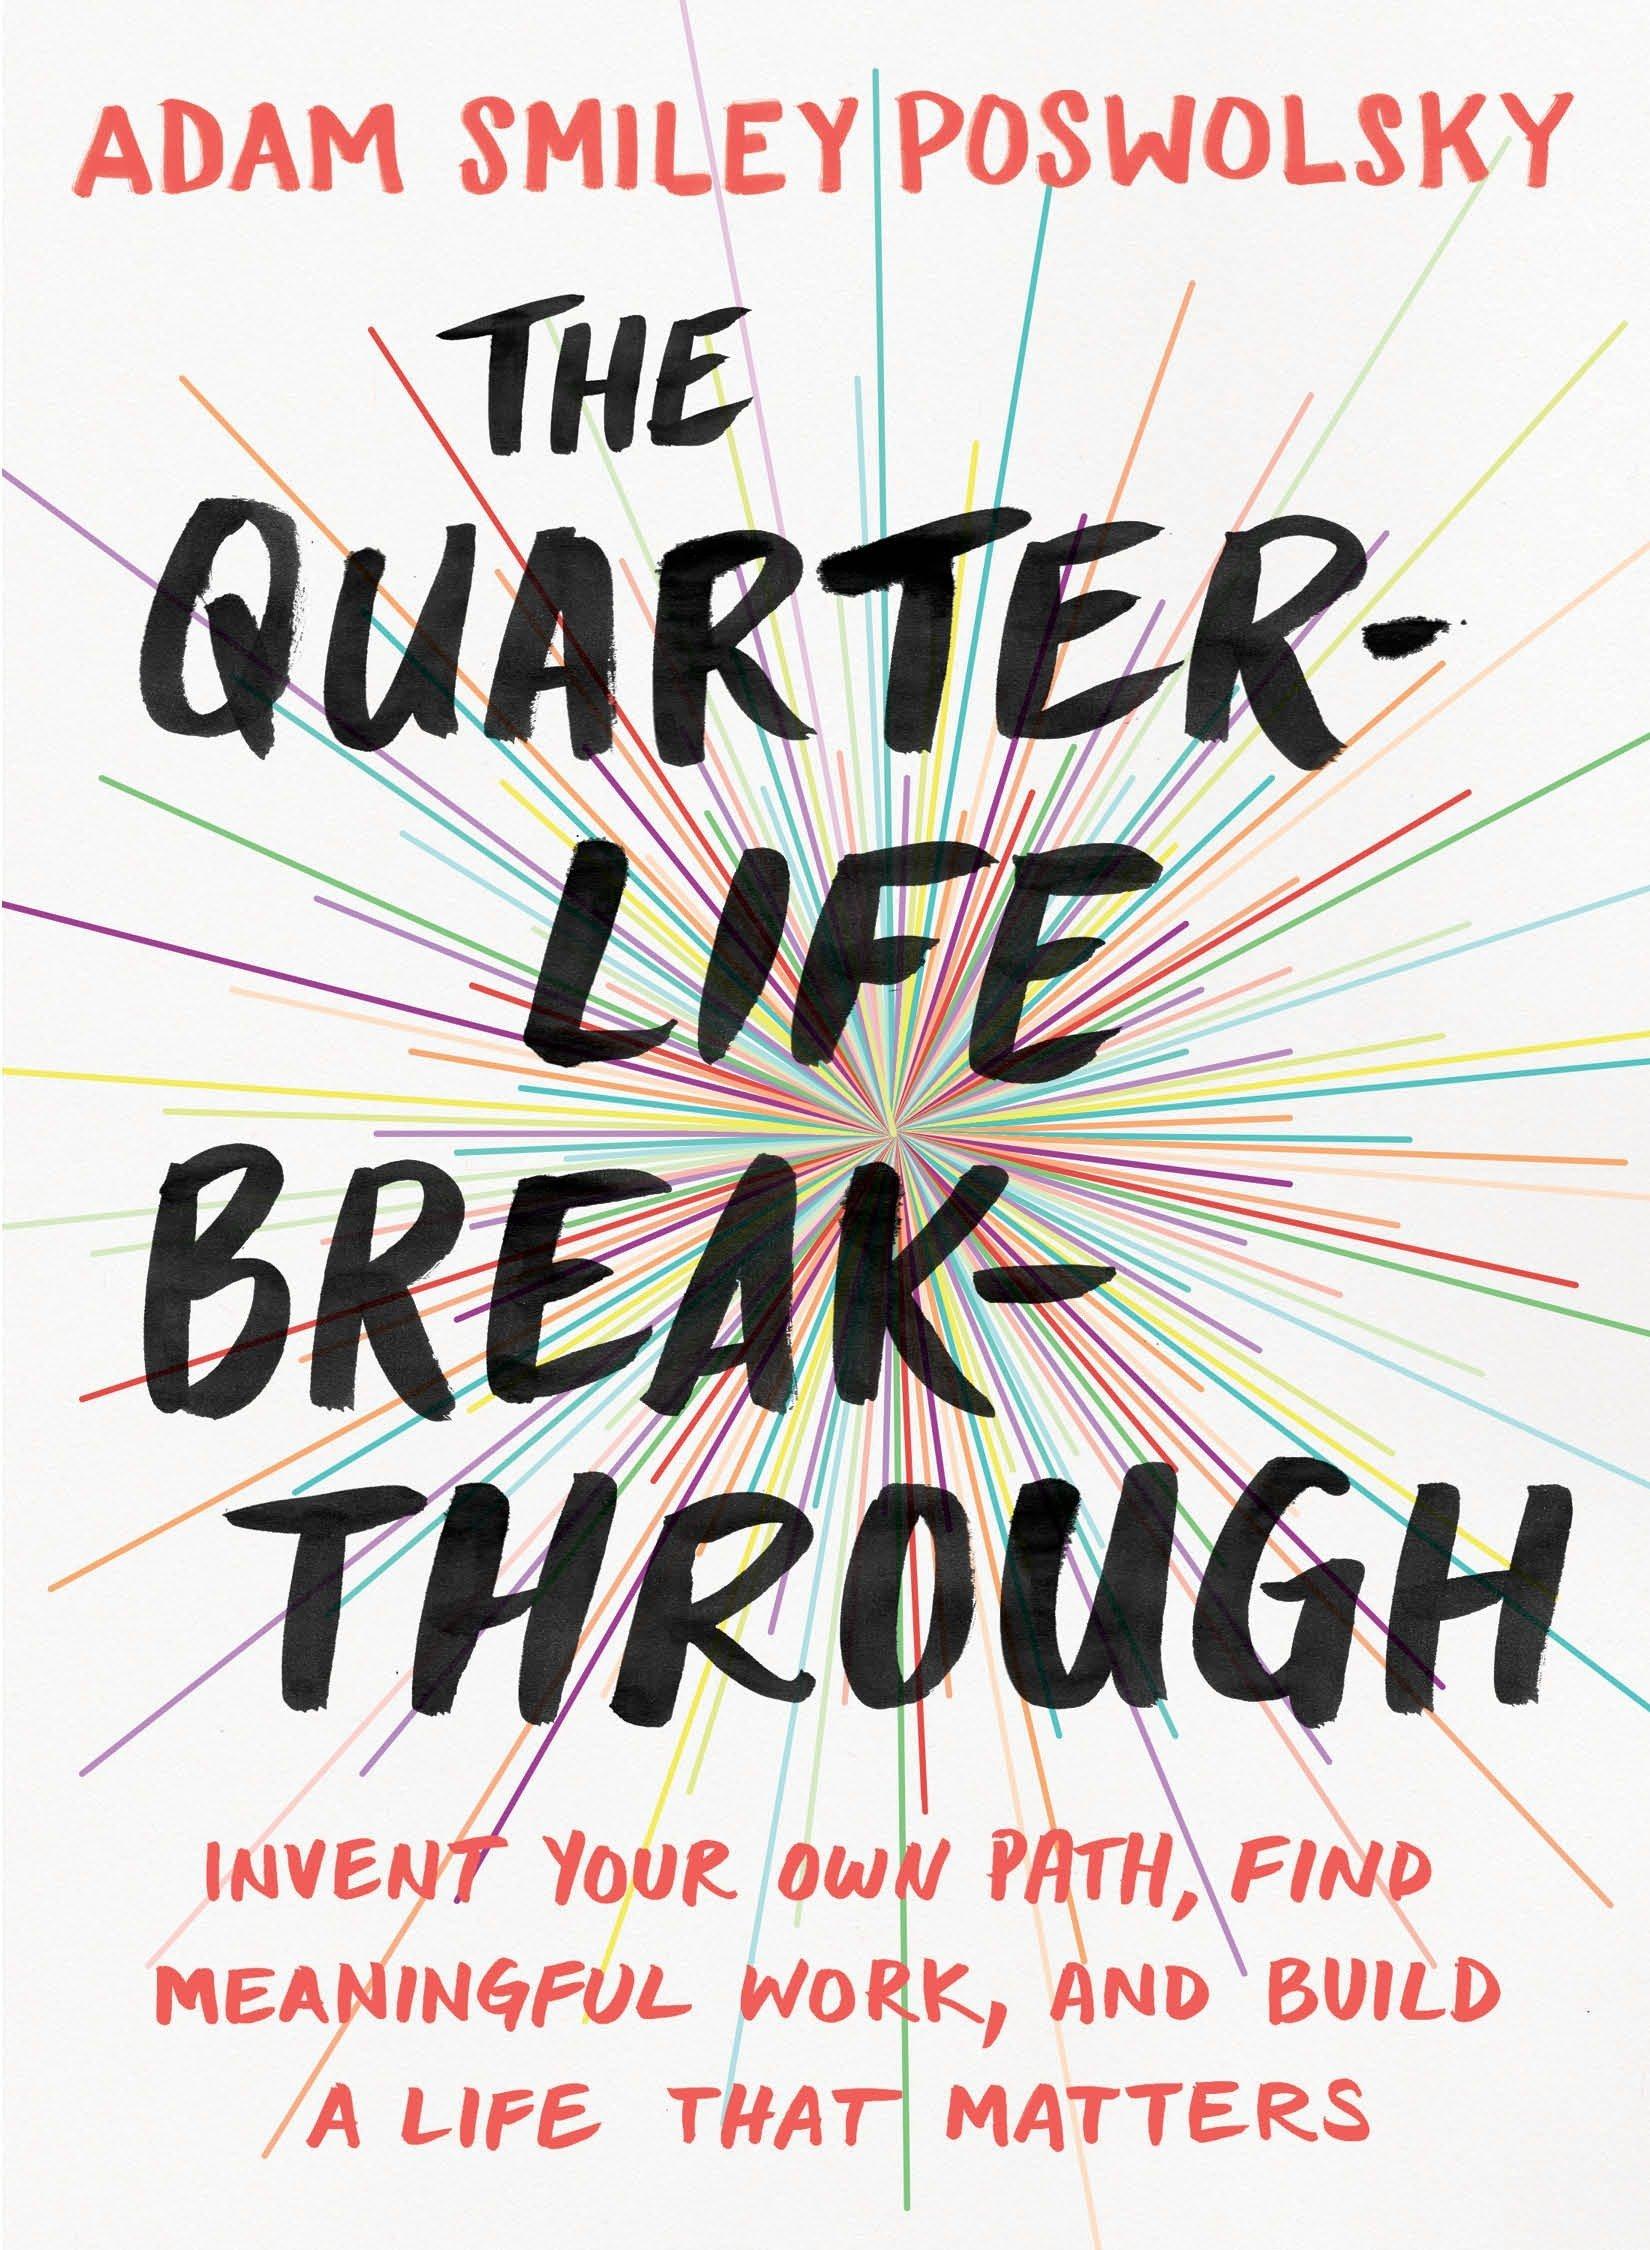 quarter life crisis was tun